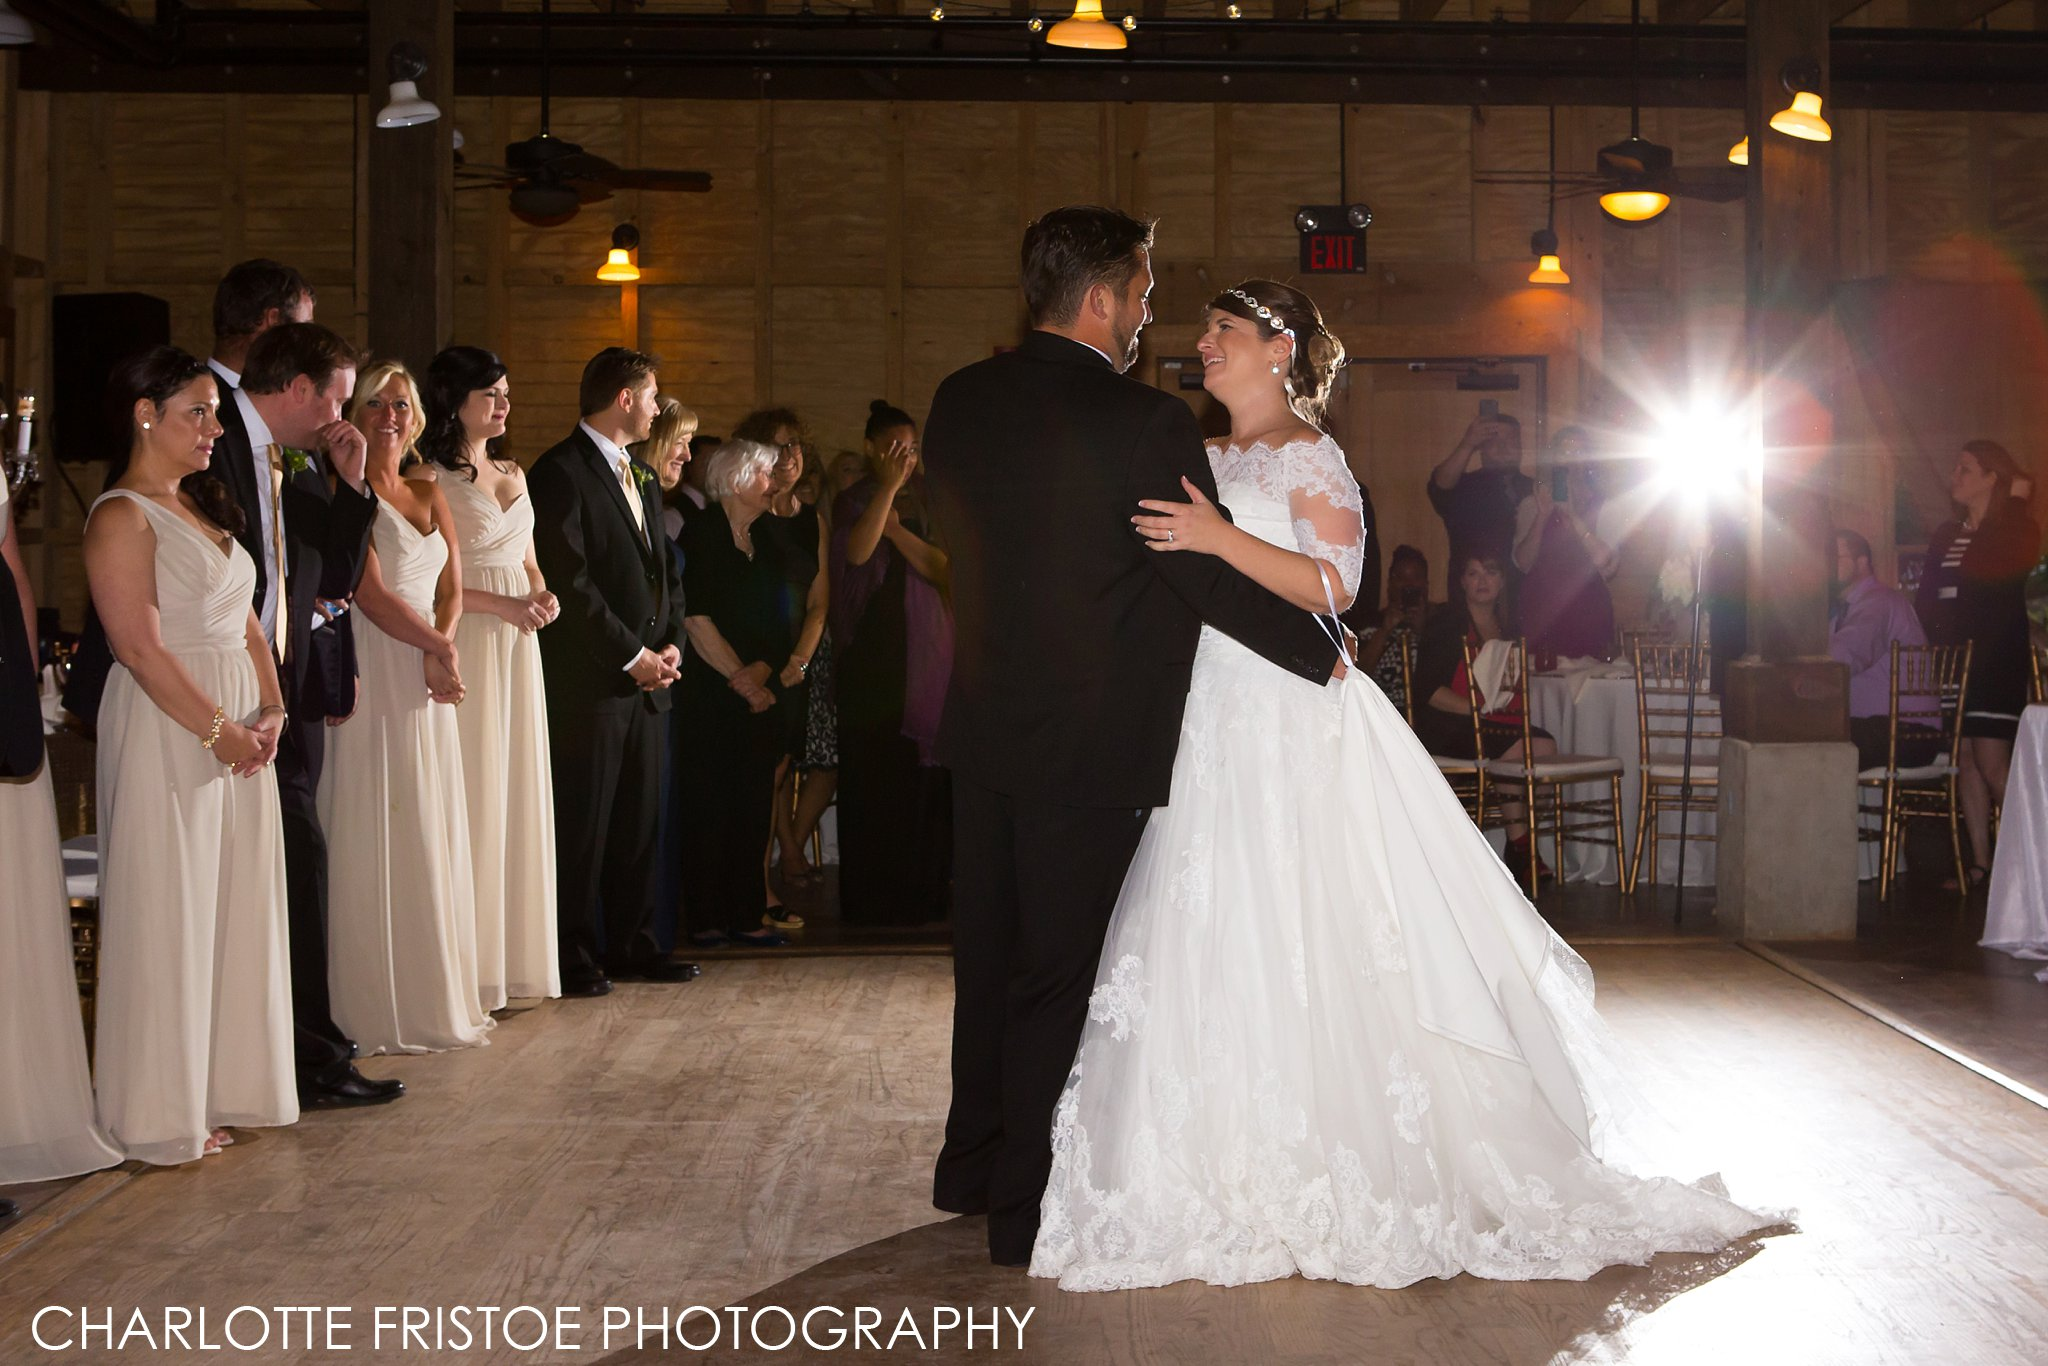 Charlotte Fristoe Photography Blog-50.jpg